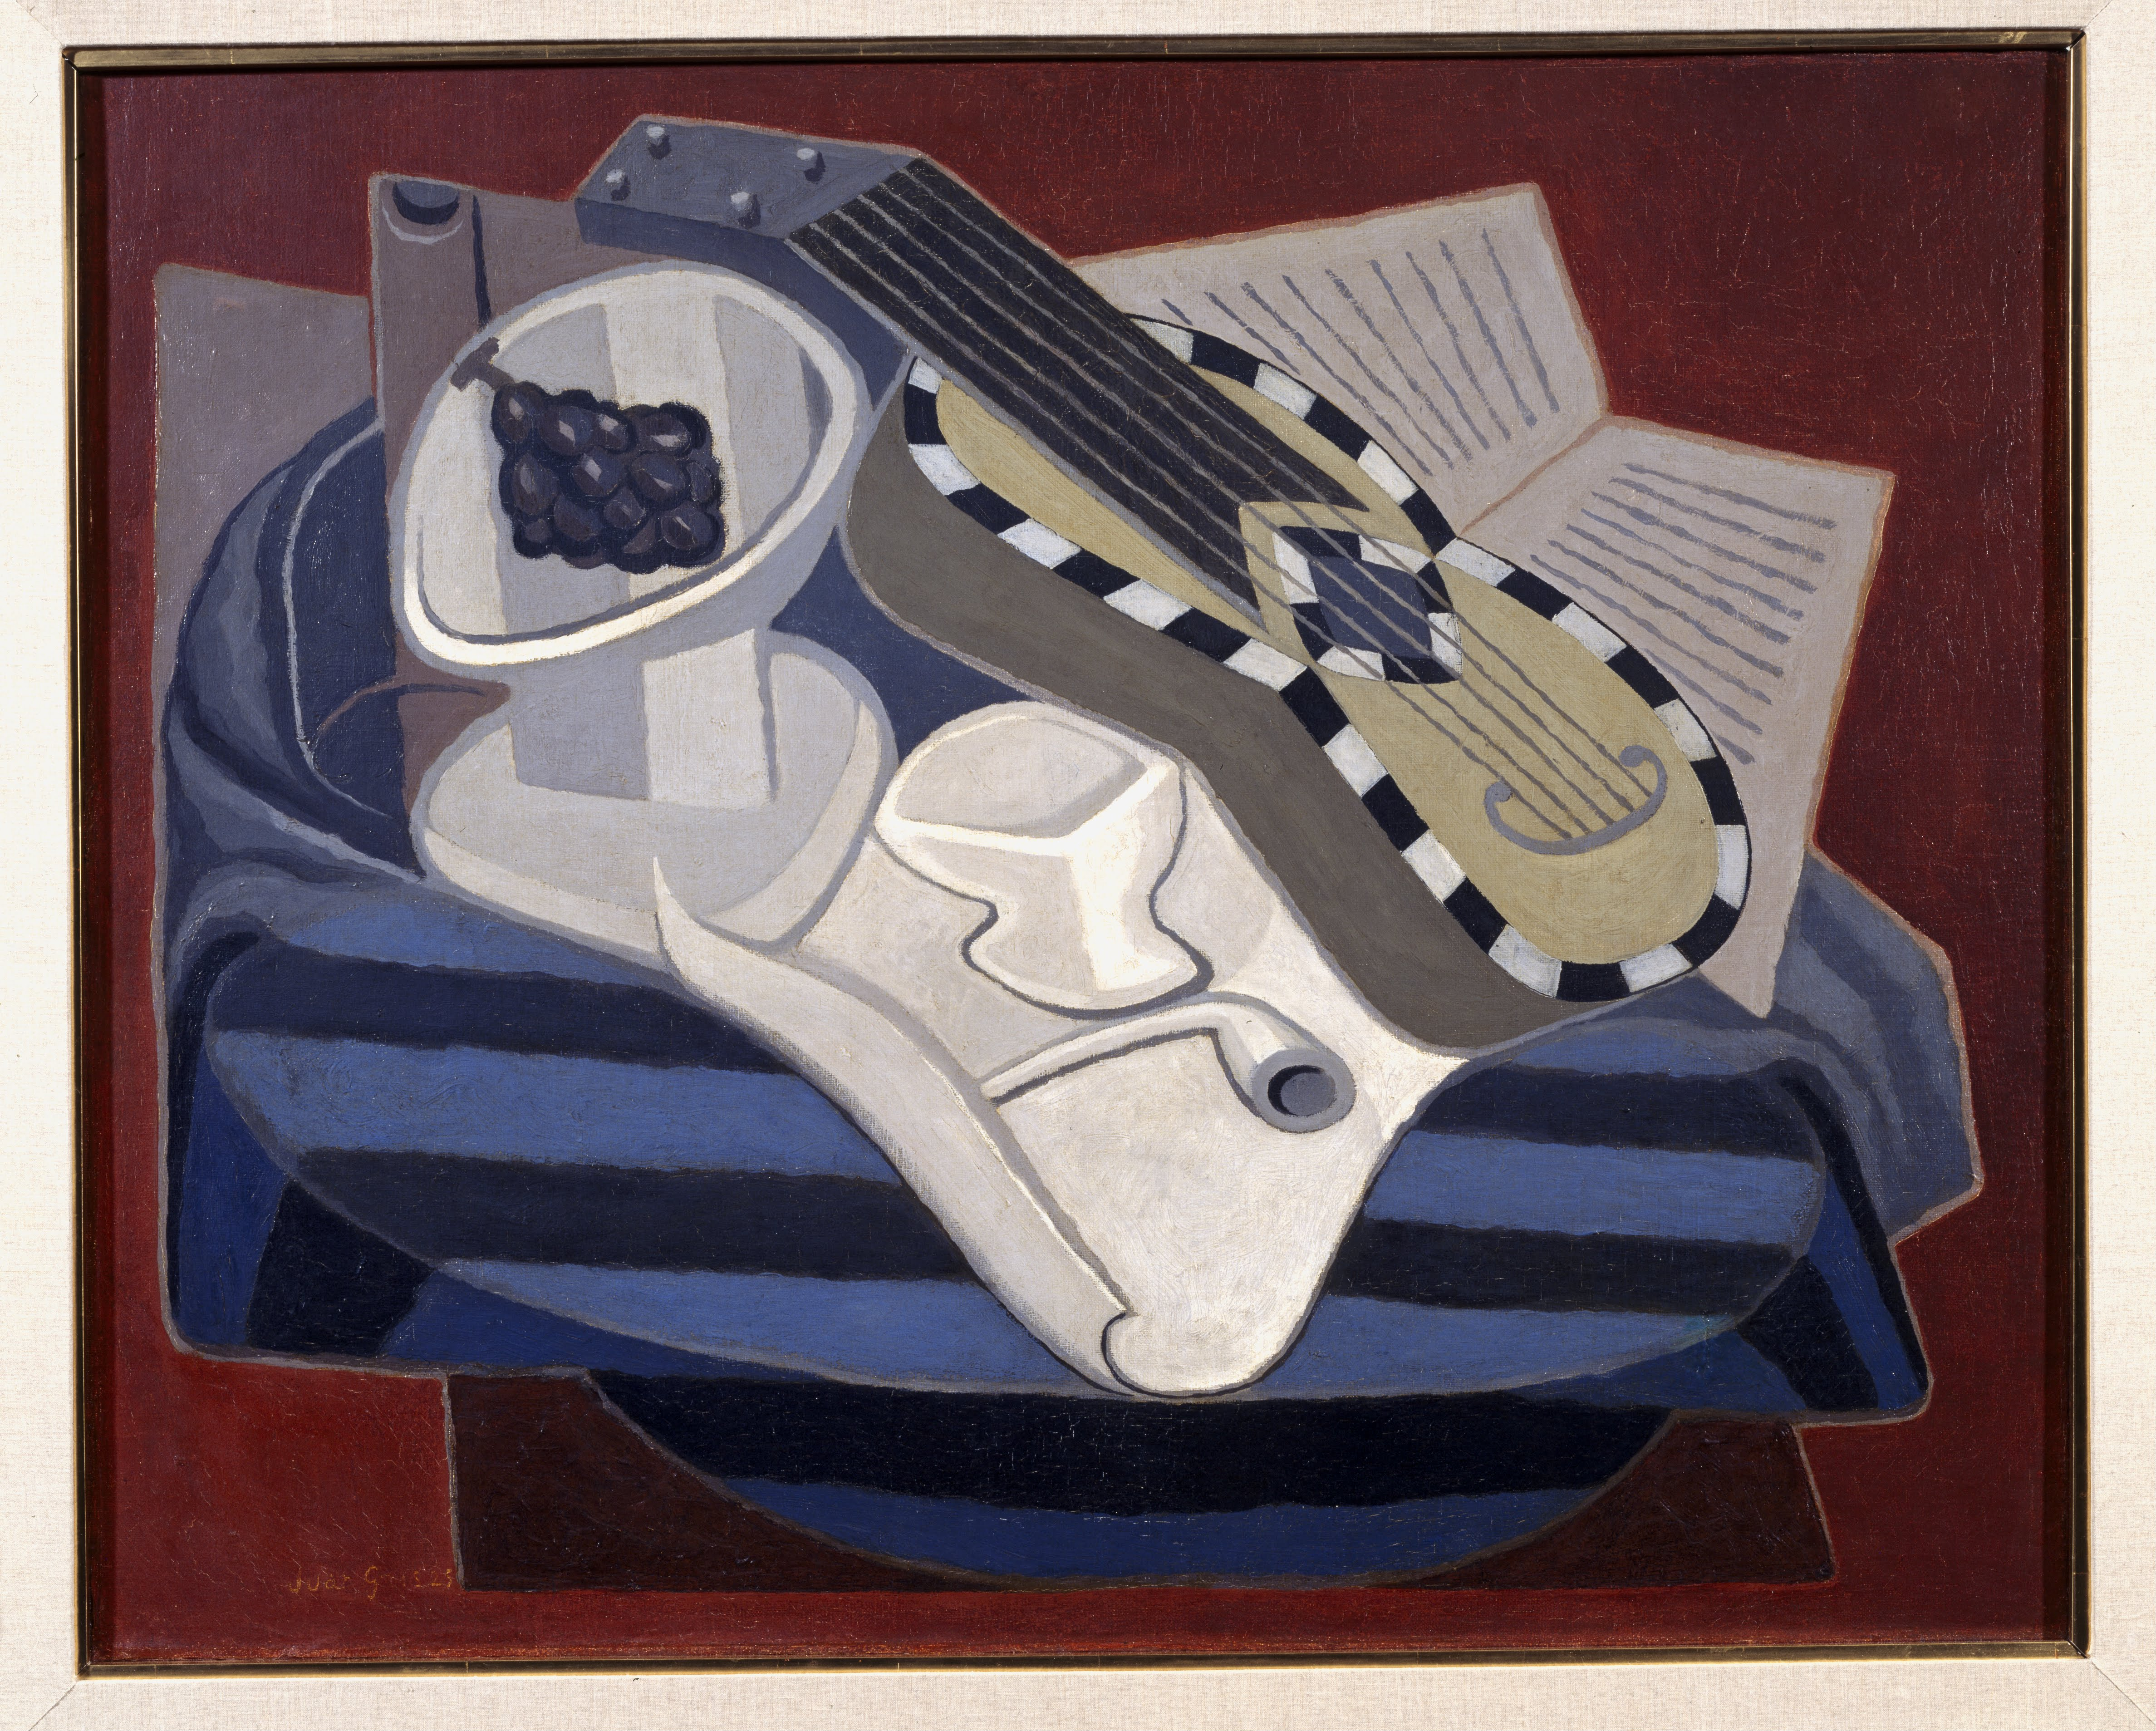 https://upload.wikimedia.org/wikipedia/commons/9/90/Juan_Gris_-_La_guitare_aux_incrustations_-_Google_Art_Project.jpg